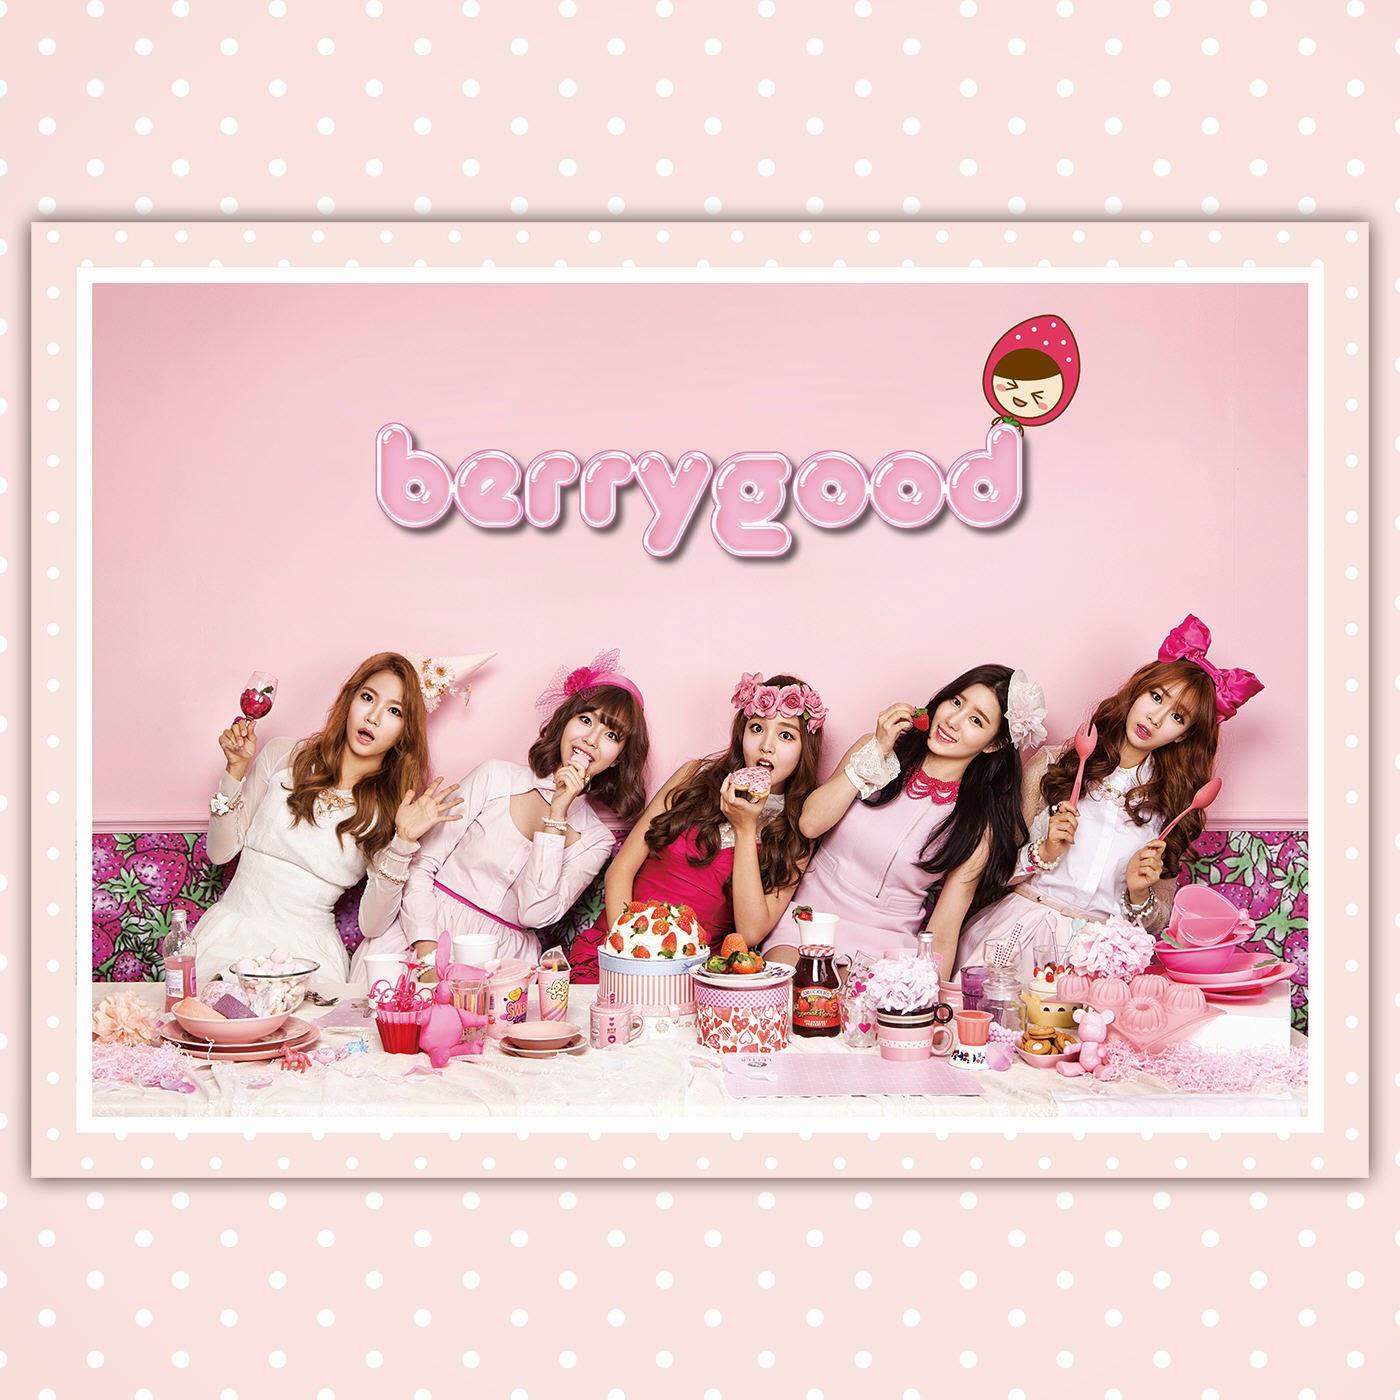 Berry Good Because Of You English Translation Lyrics